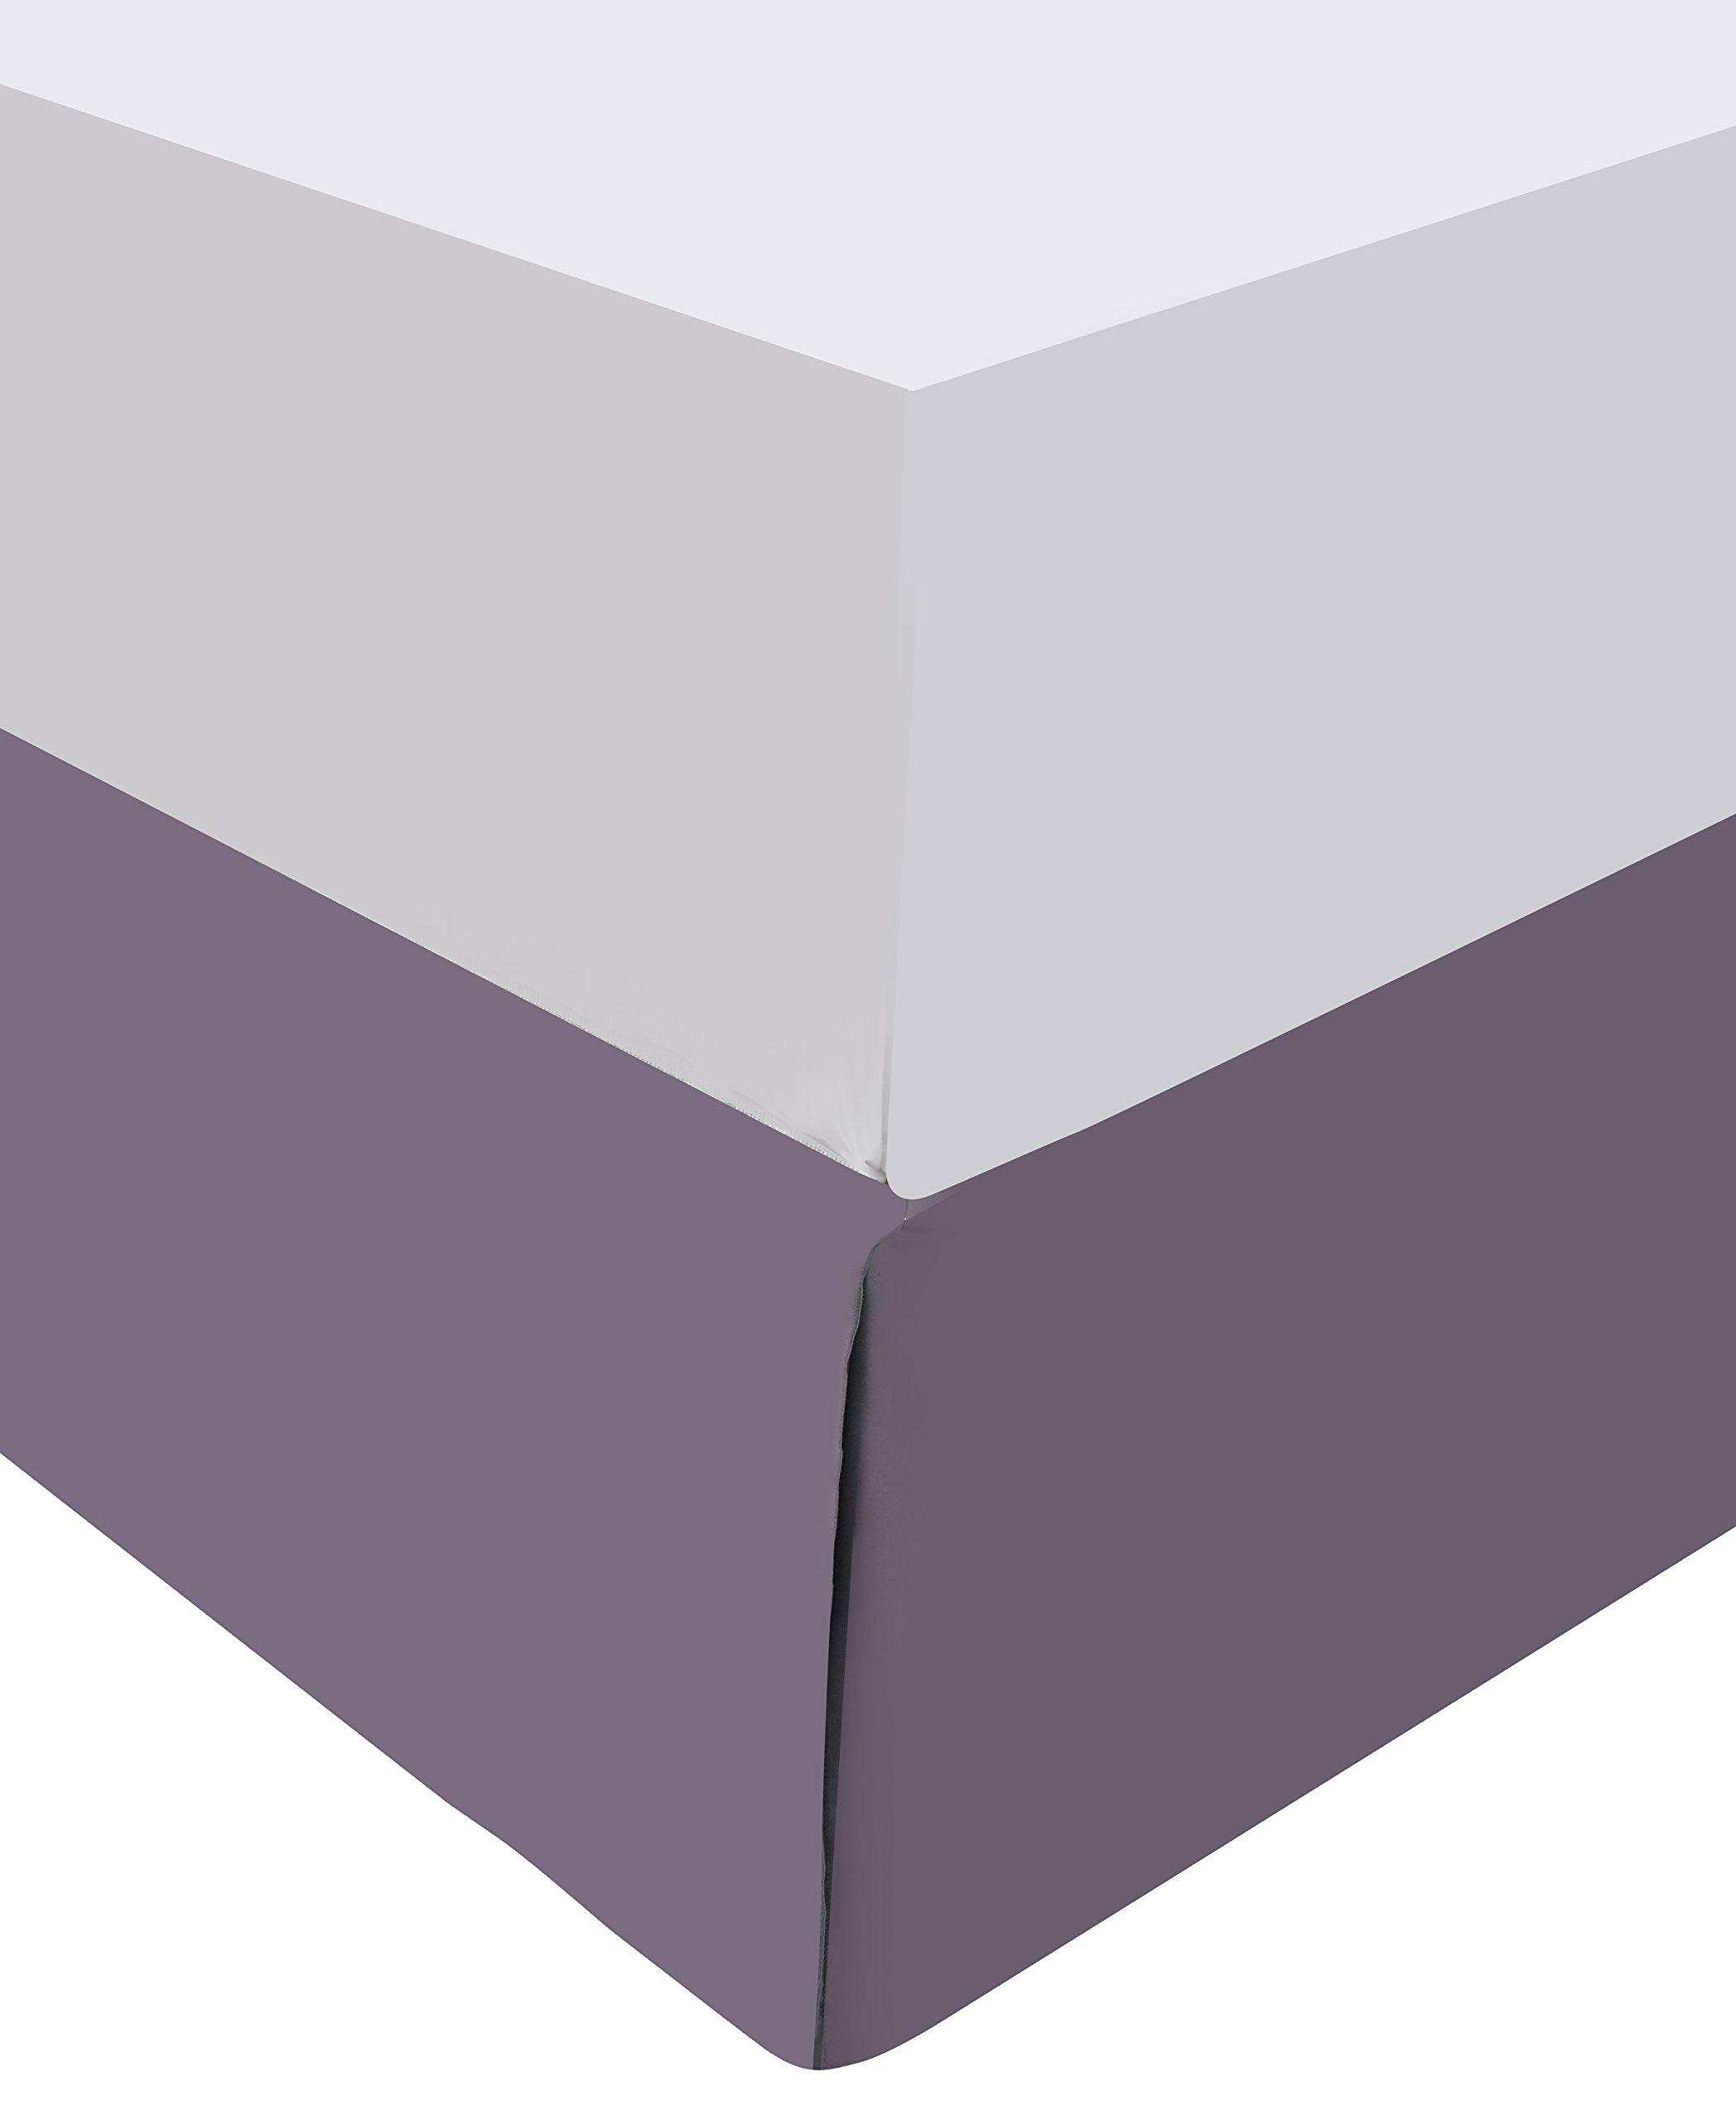 Wonder-Home 8-pc. Elegant Purple Comforter Set, Oversized Natural Leaf Printed Microfiber Bedding Set, Polyester Overfilled, Medium Weight, King, 106''x96''